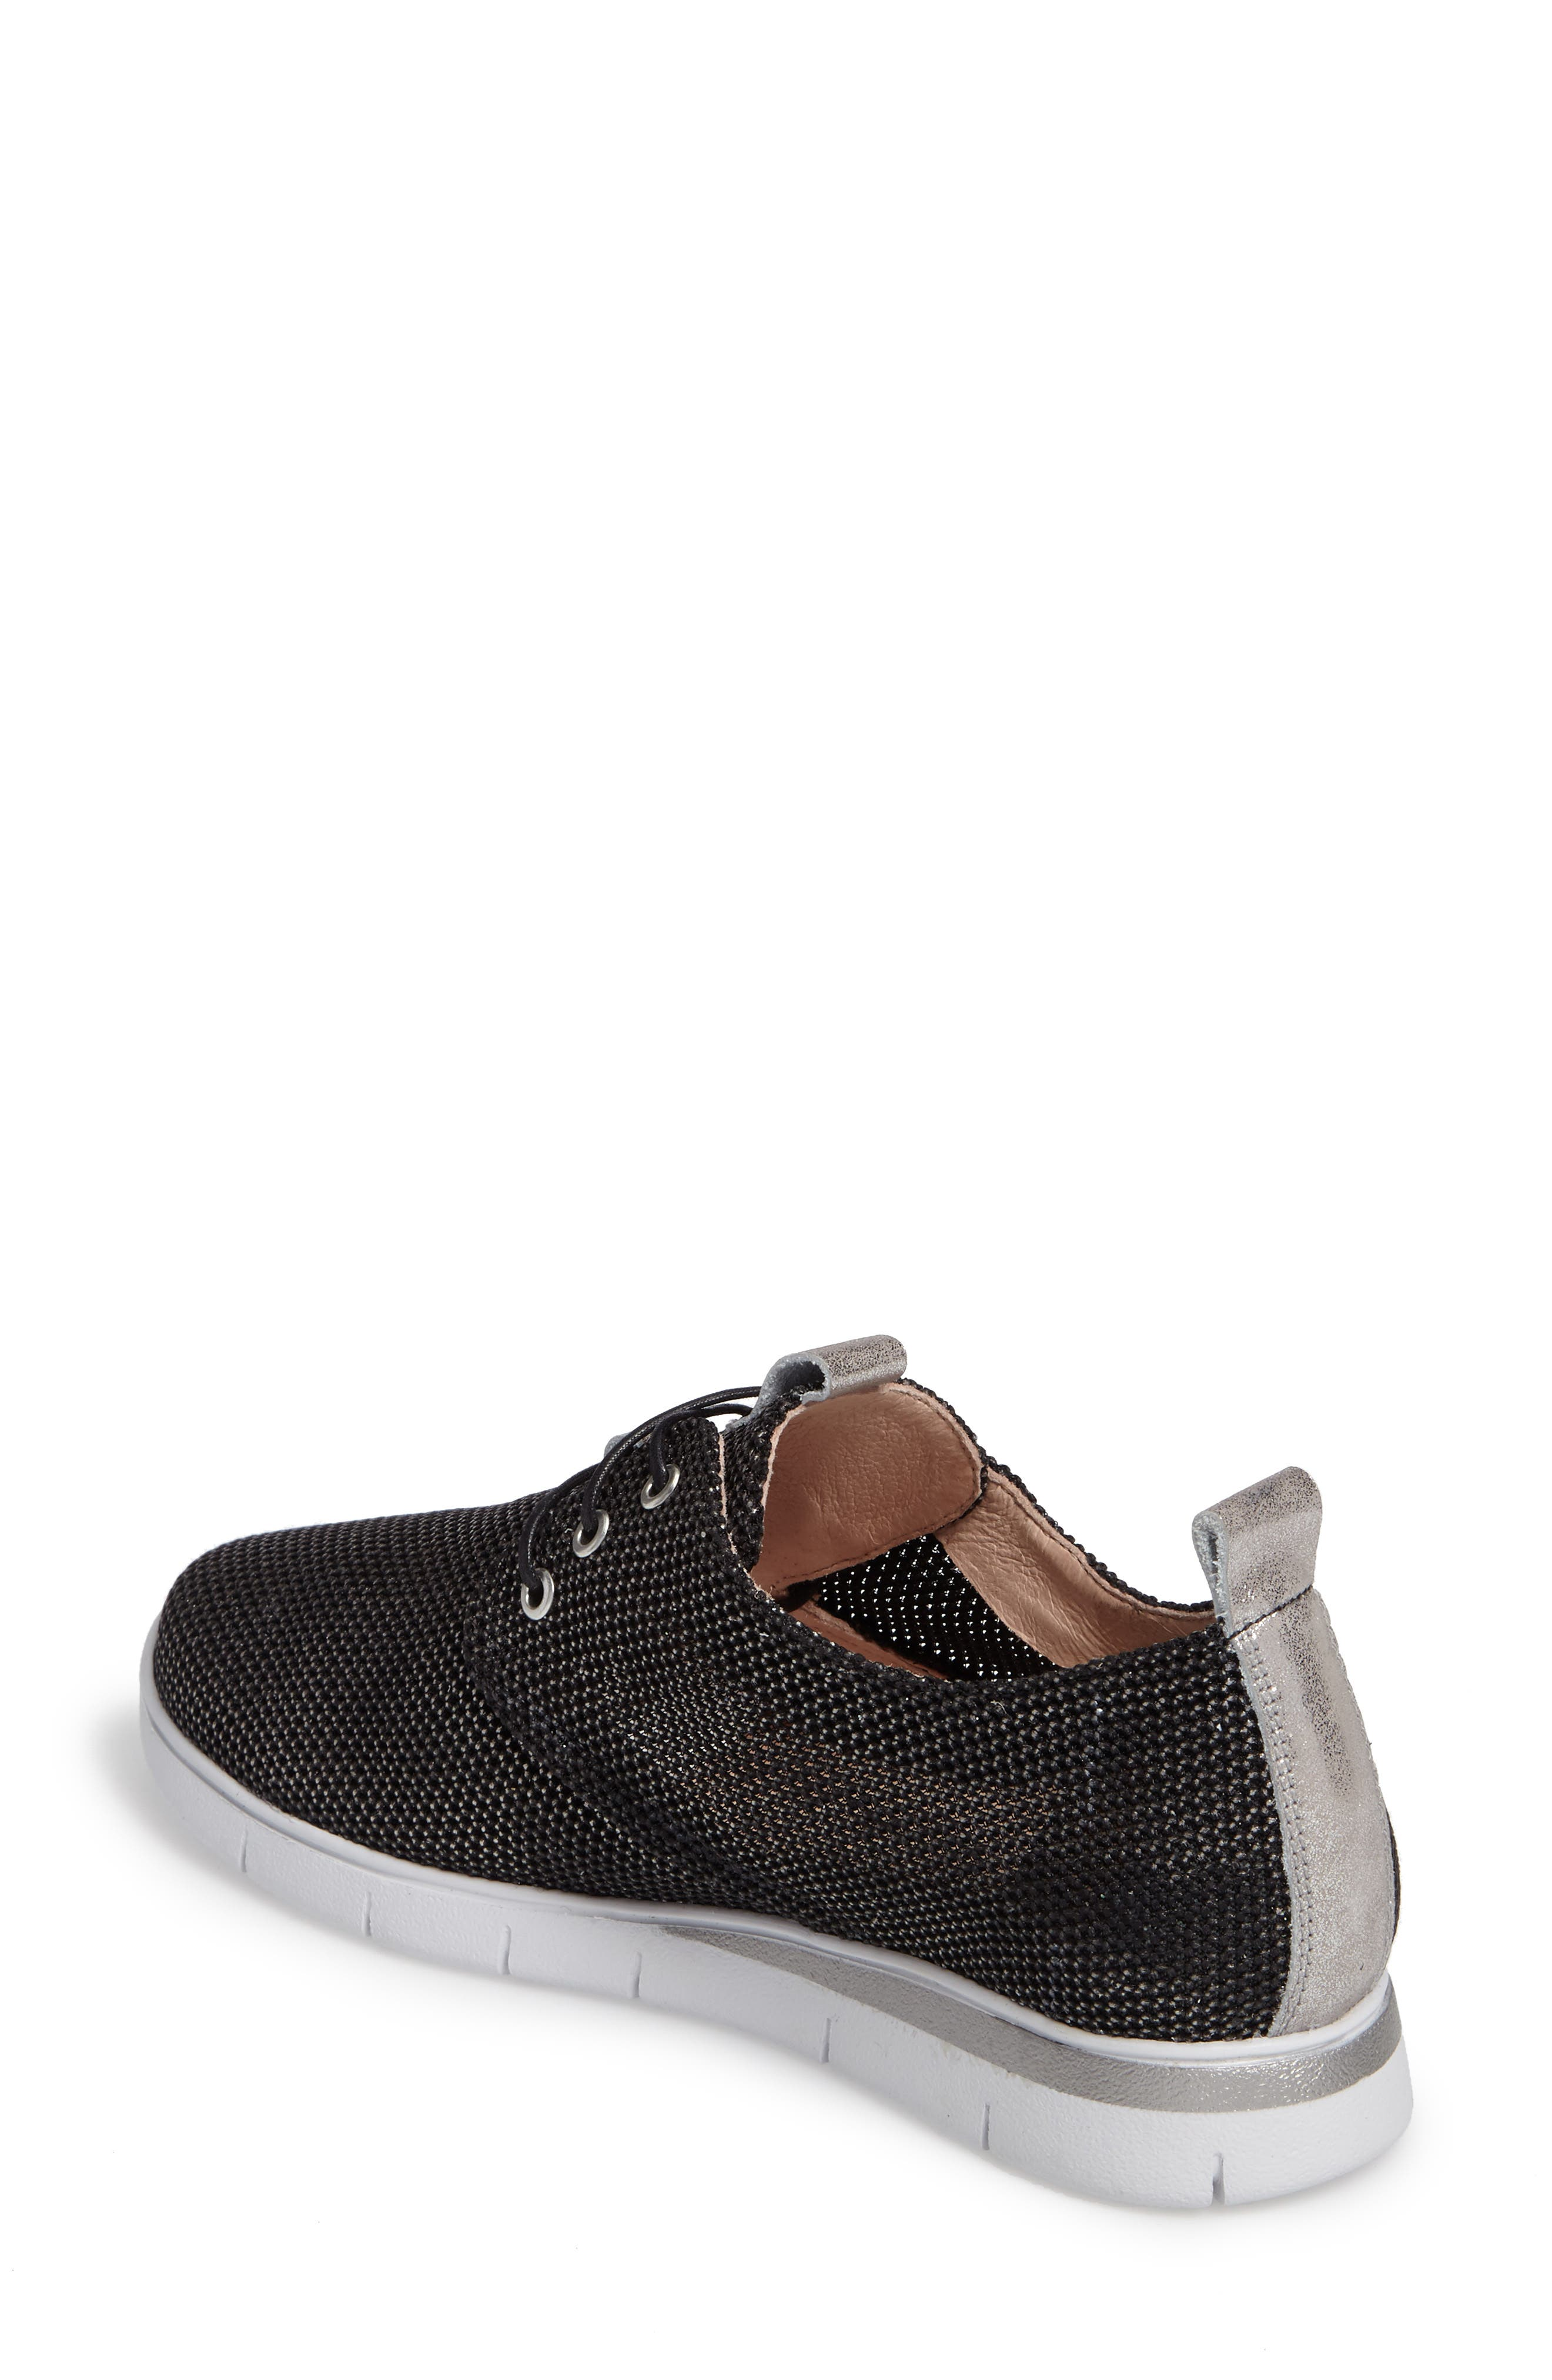 Gala Perforated Sneaker,                             Alternate thumbnail 2, color,                             001